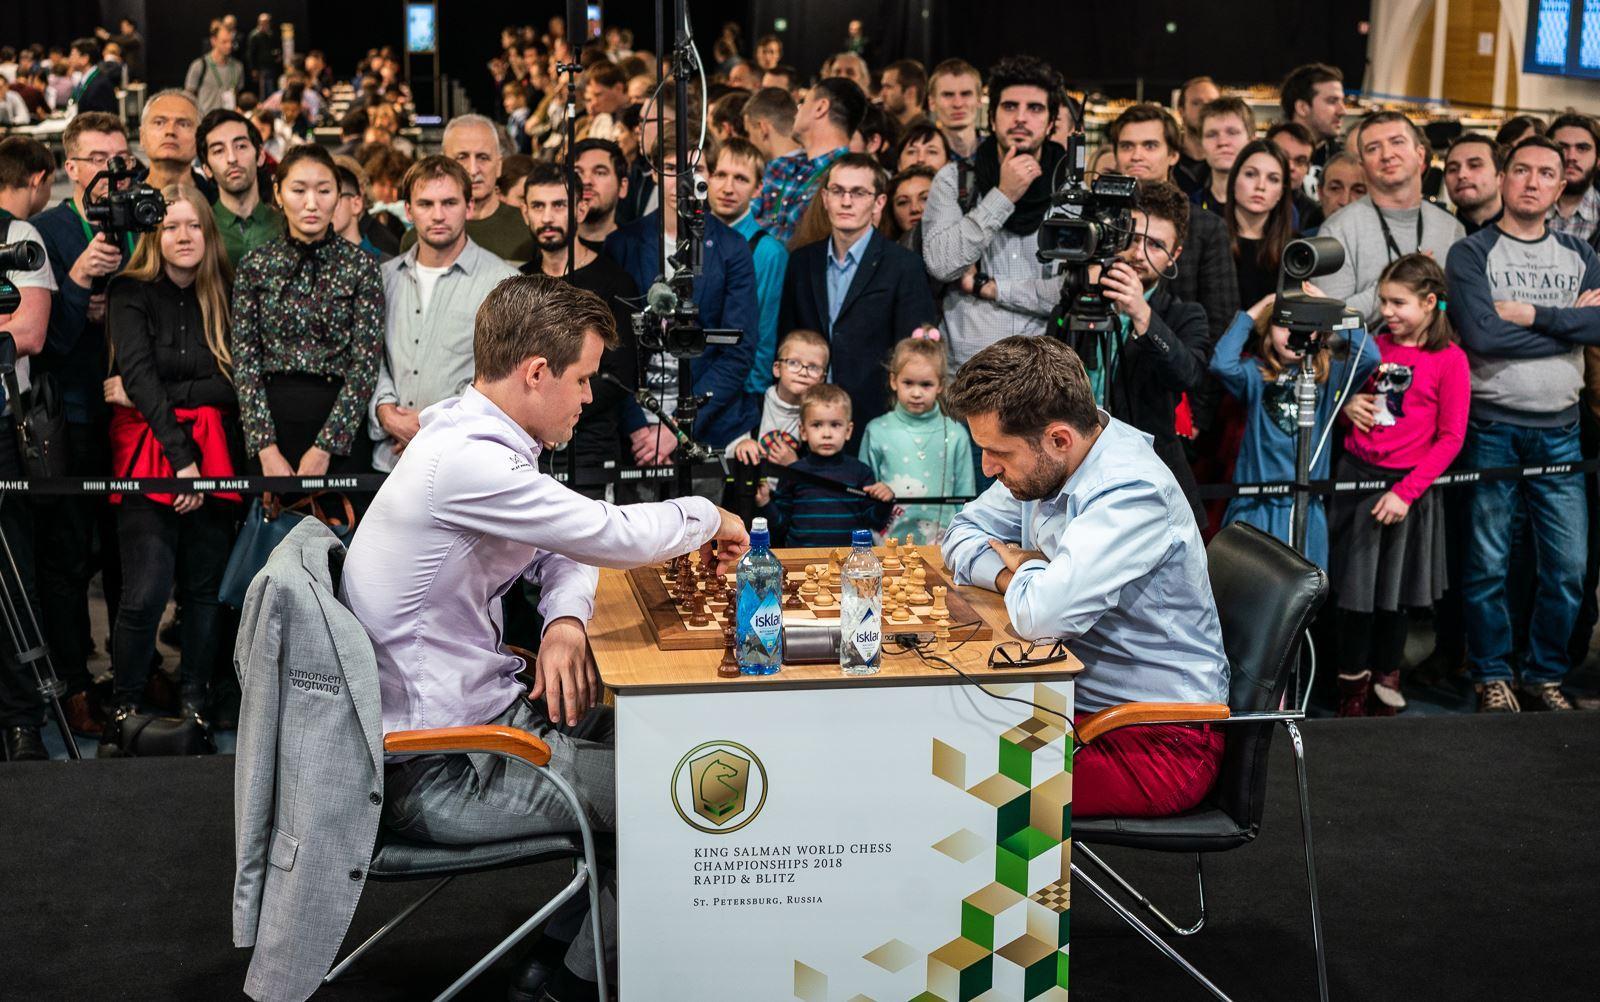 King Salman World Rapid and Blitz Chess Championship 2018